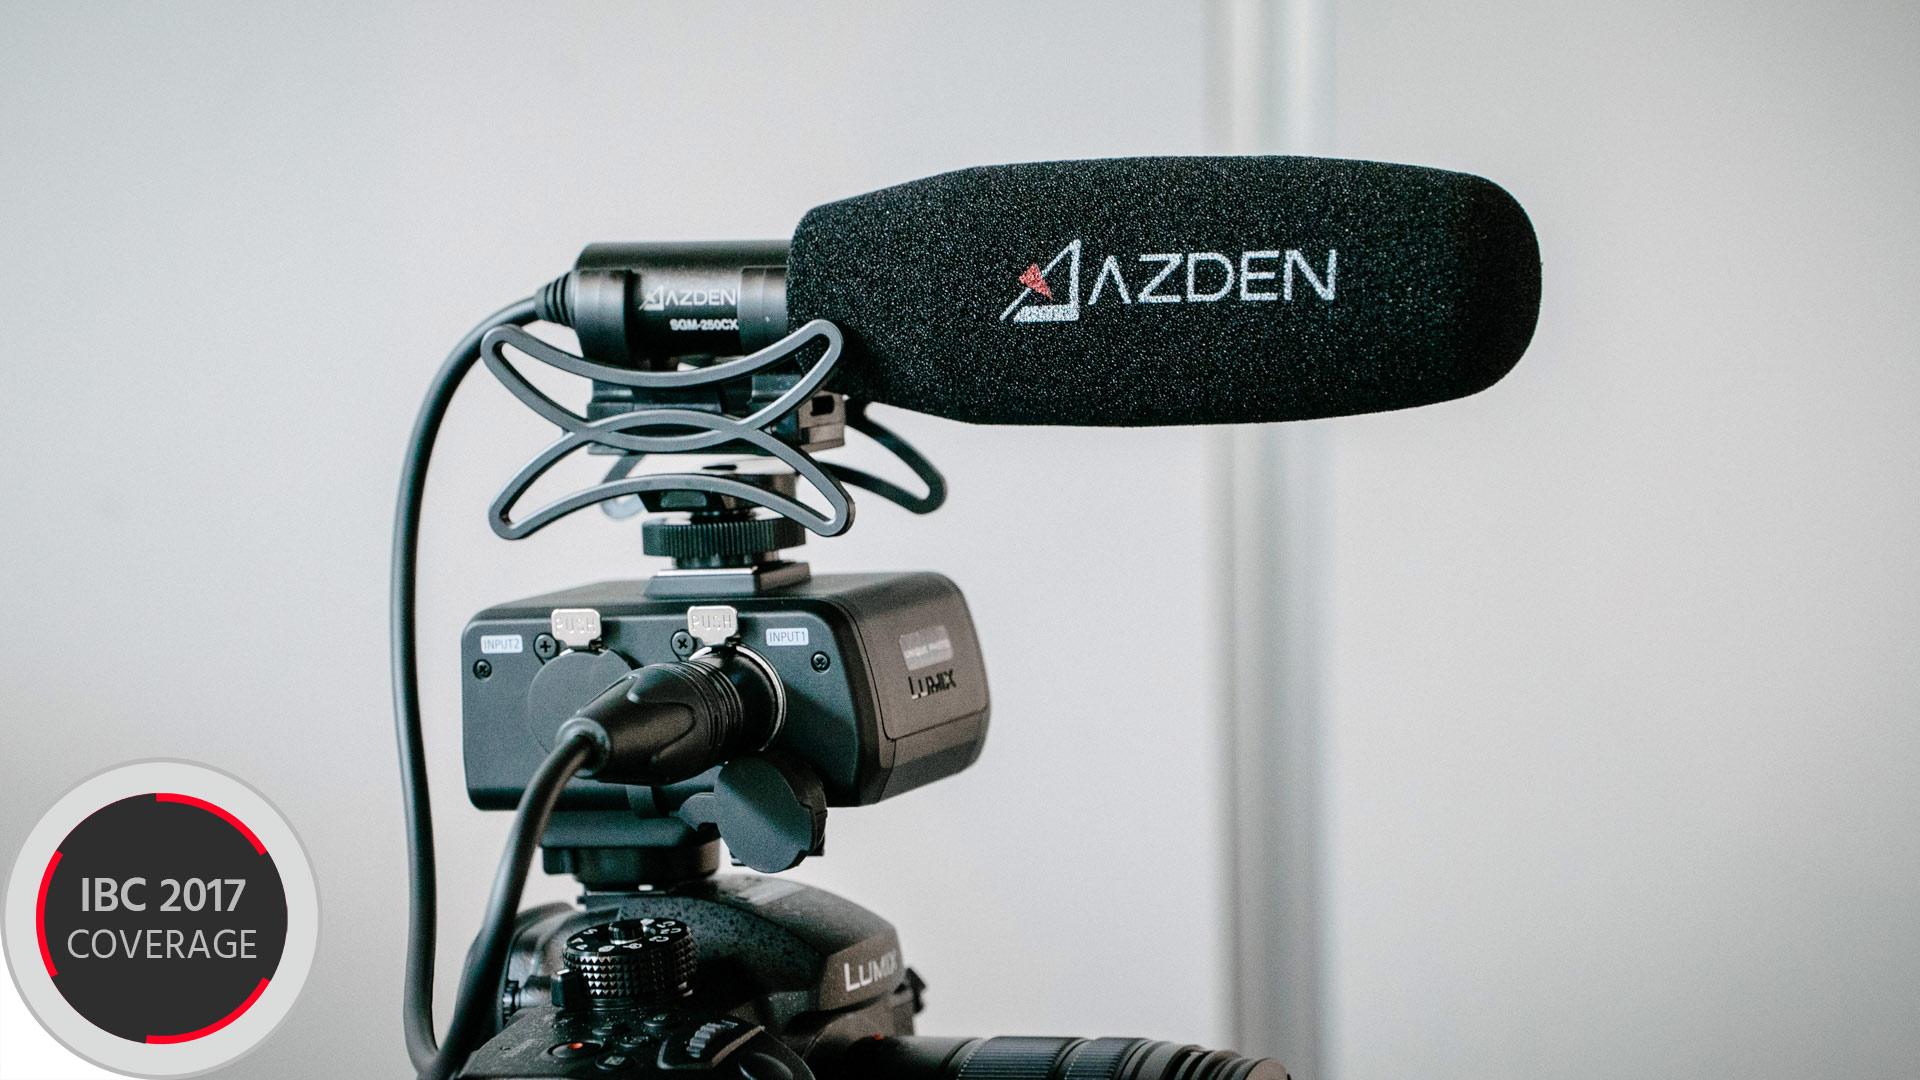 AzdenのSGM-250CX - 小型軽量のオンカメラマイクロフォン